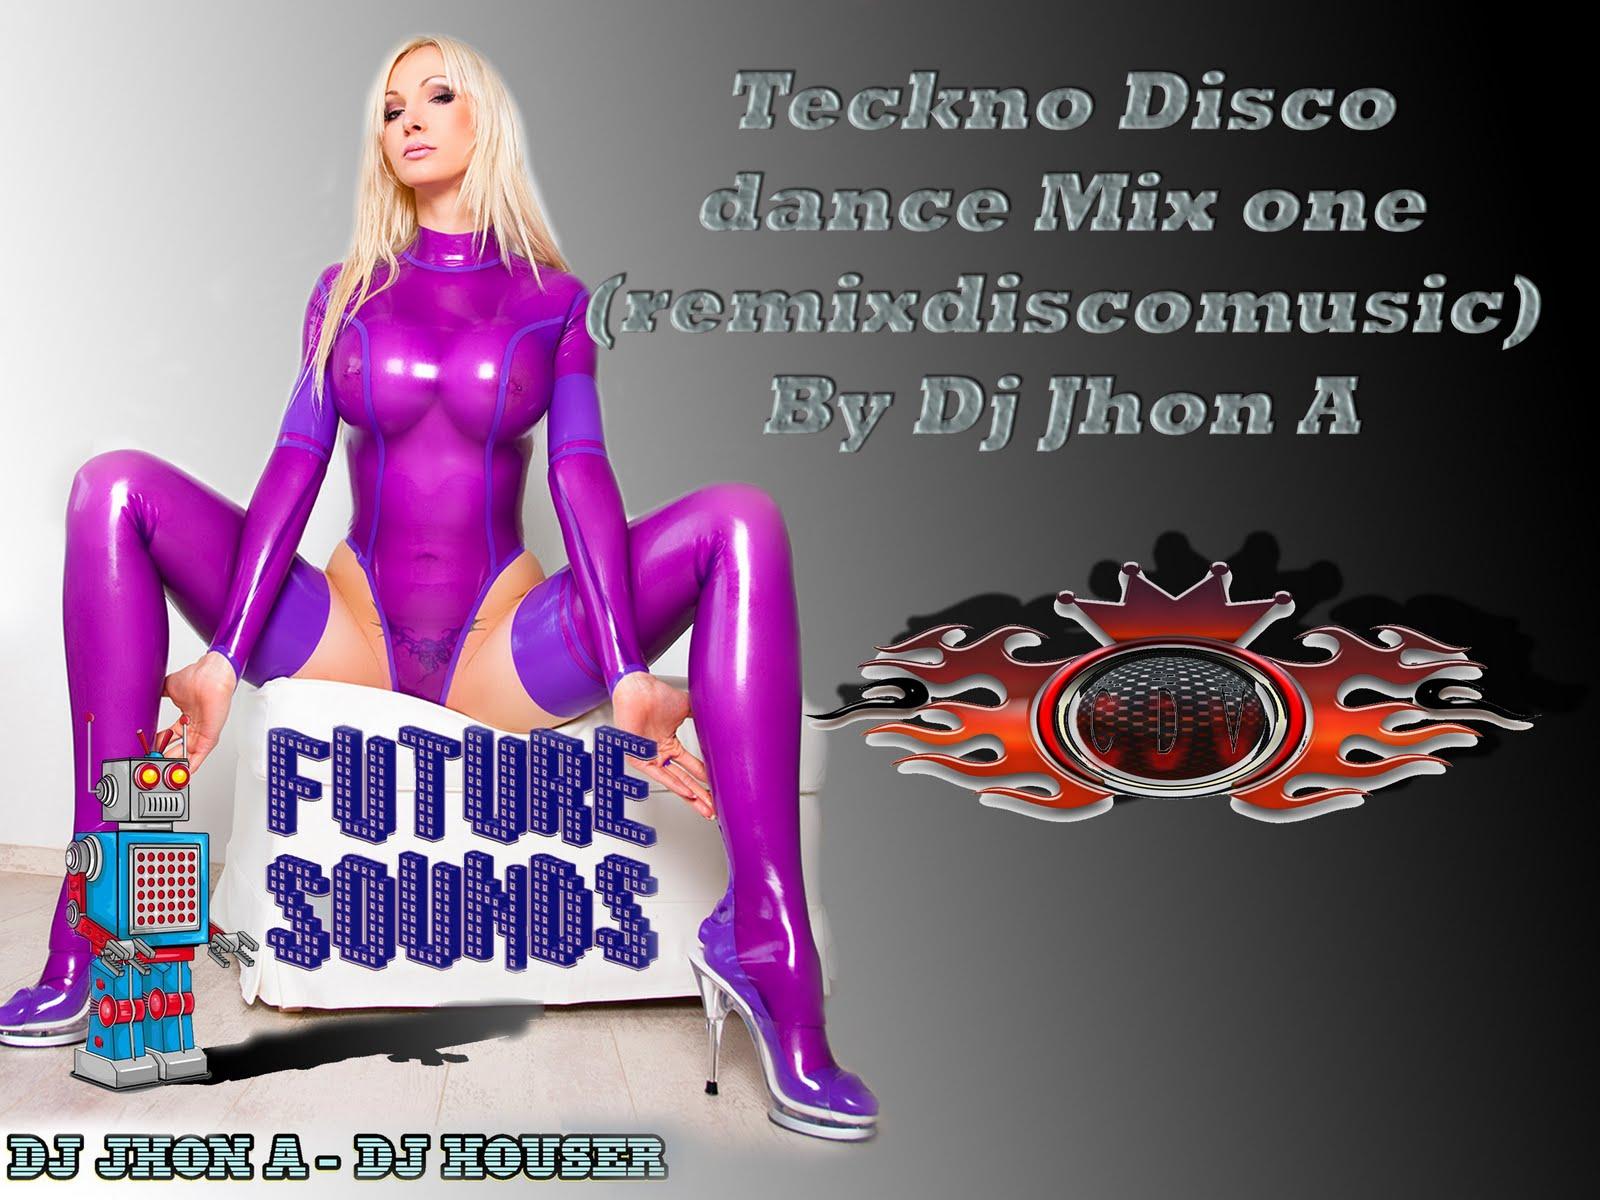 http://1.bp.blogspot.com/-JqG4j3j598o/TgerqmhJrCI/AAAAAAAAIsE/igWz2N4GwHs/s1600/Teckno+Disco+dance+Mix+one+%2528remixdiscomusic%2529+By+Dj+Jhon+A+web.jpg